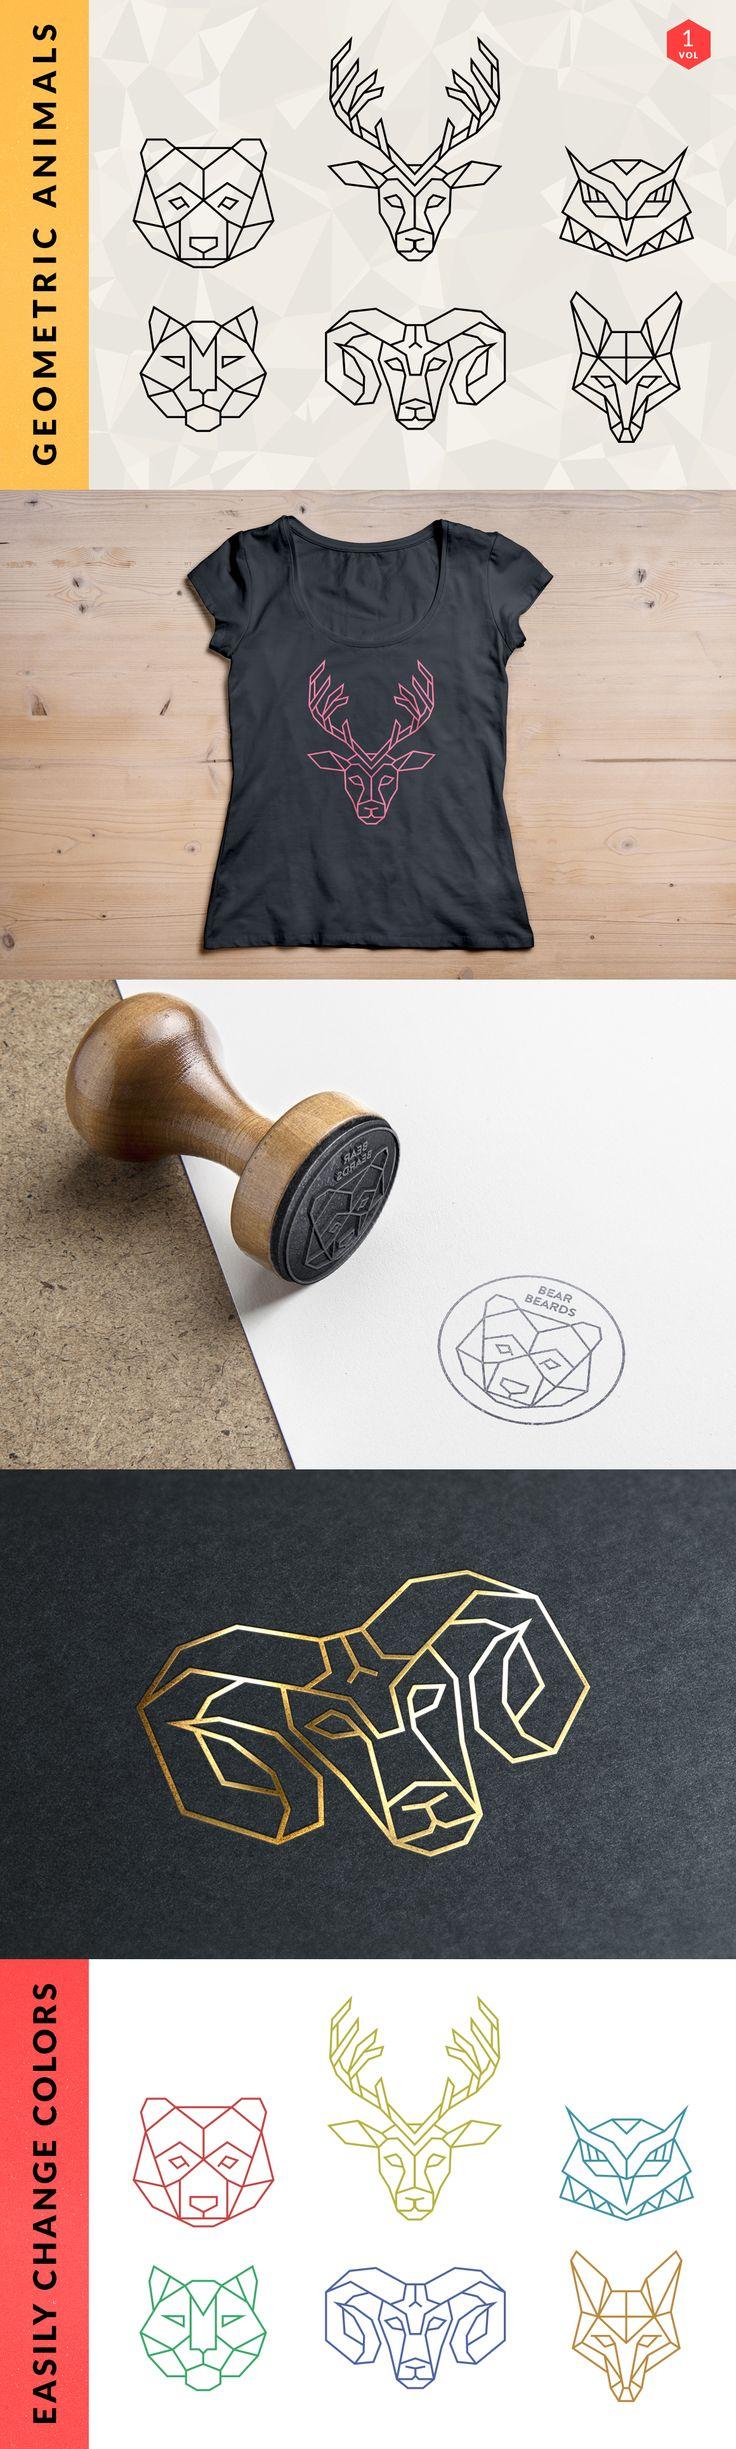 Geometric Animal Logos by Adrian Pelletier.